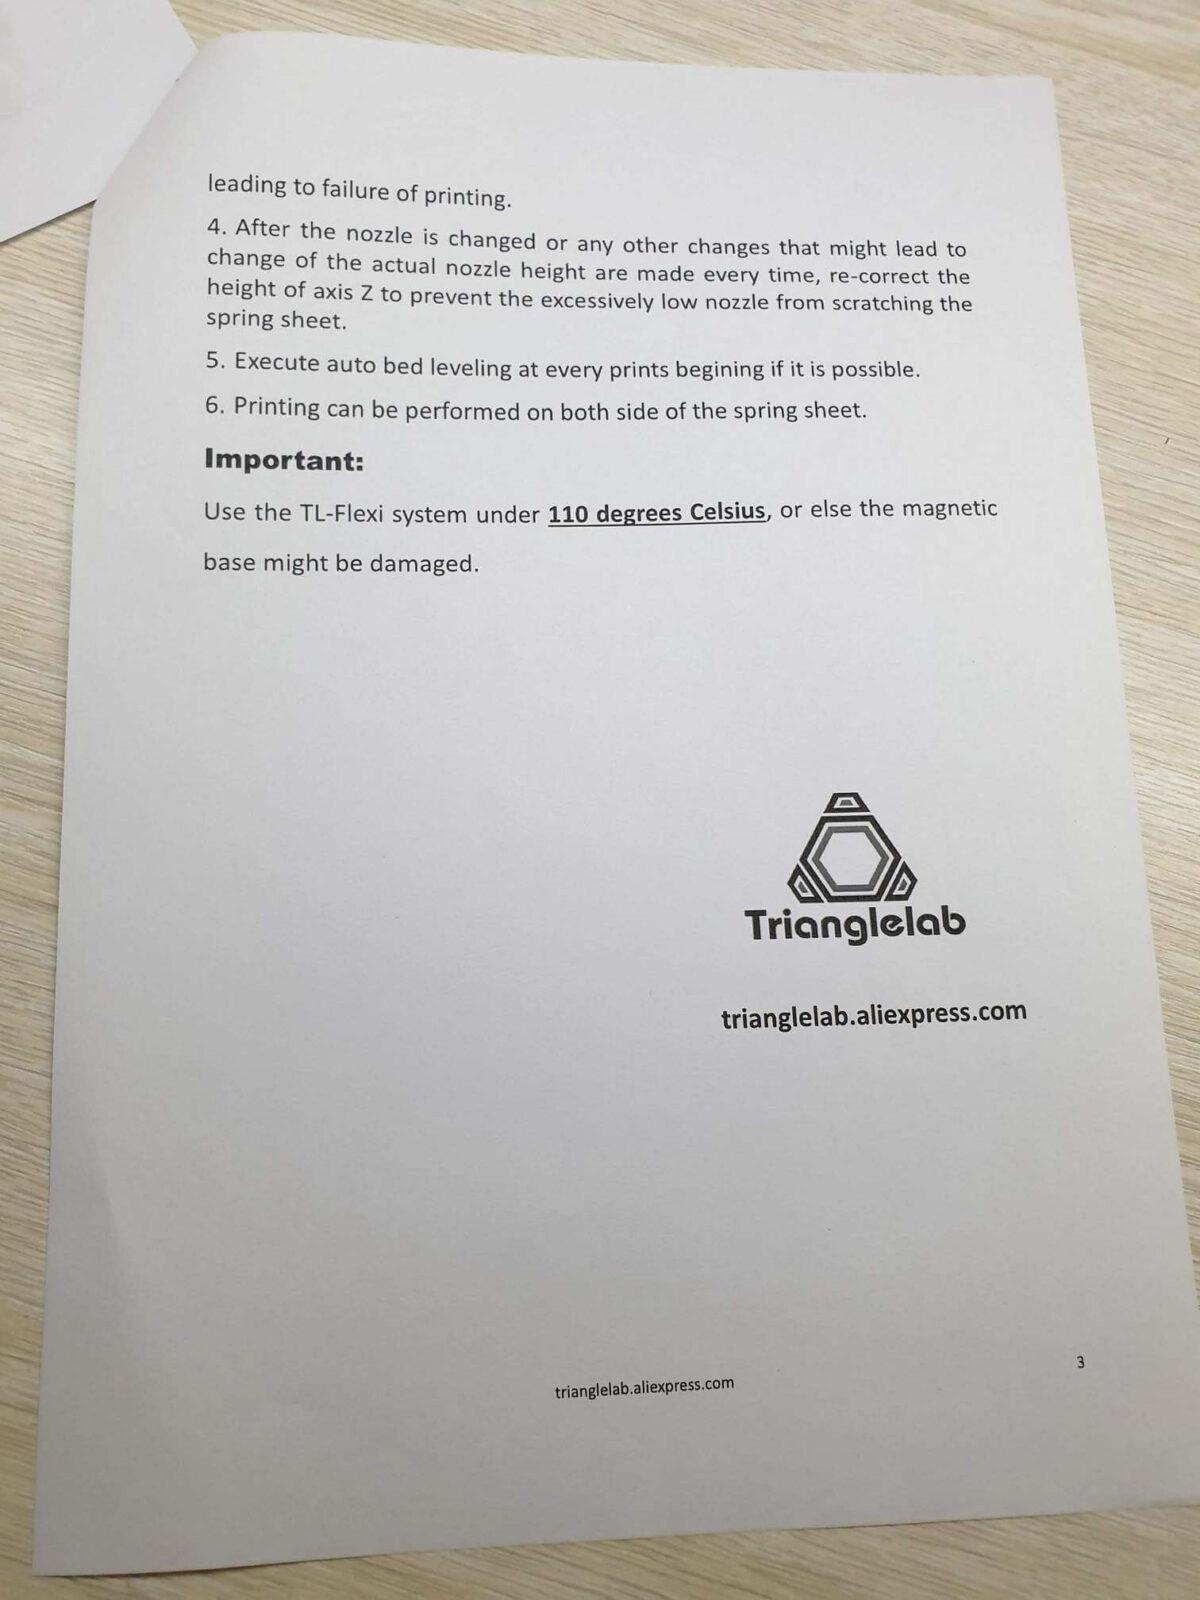 Trianglelab Textured PEI Sheet - Guide